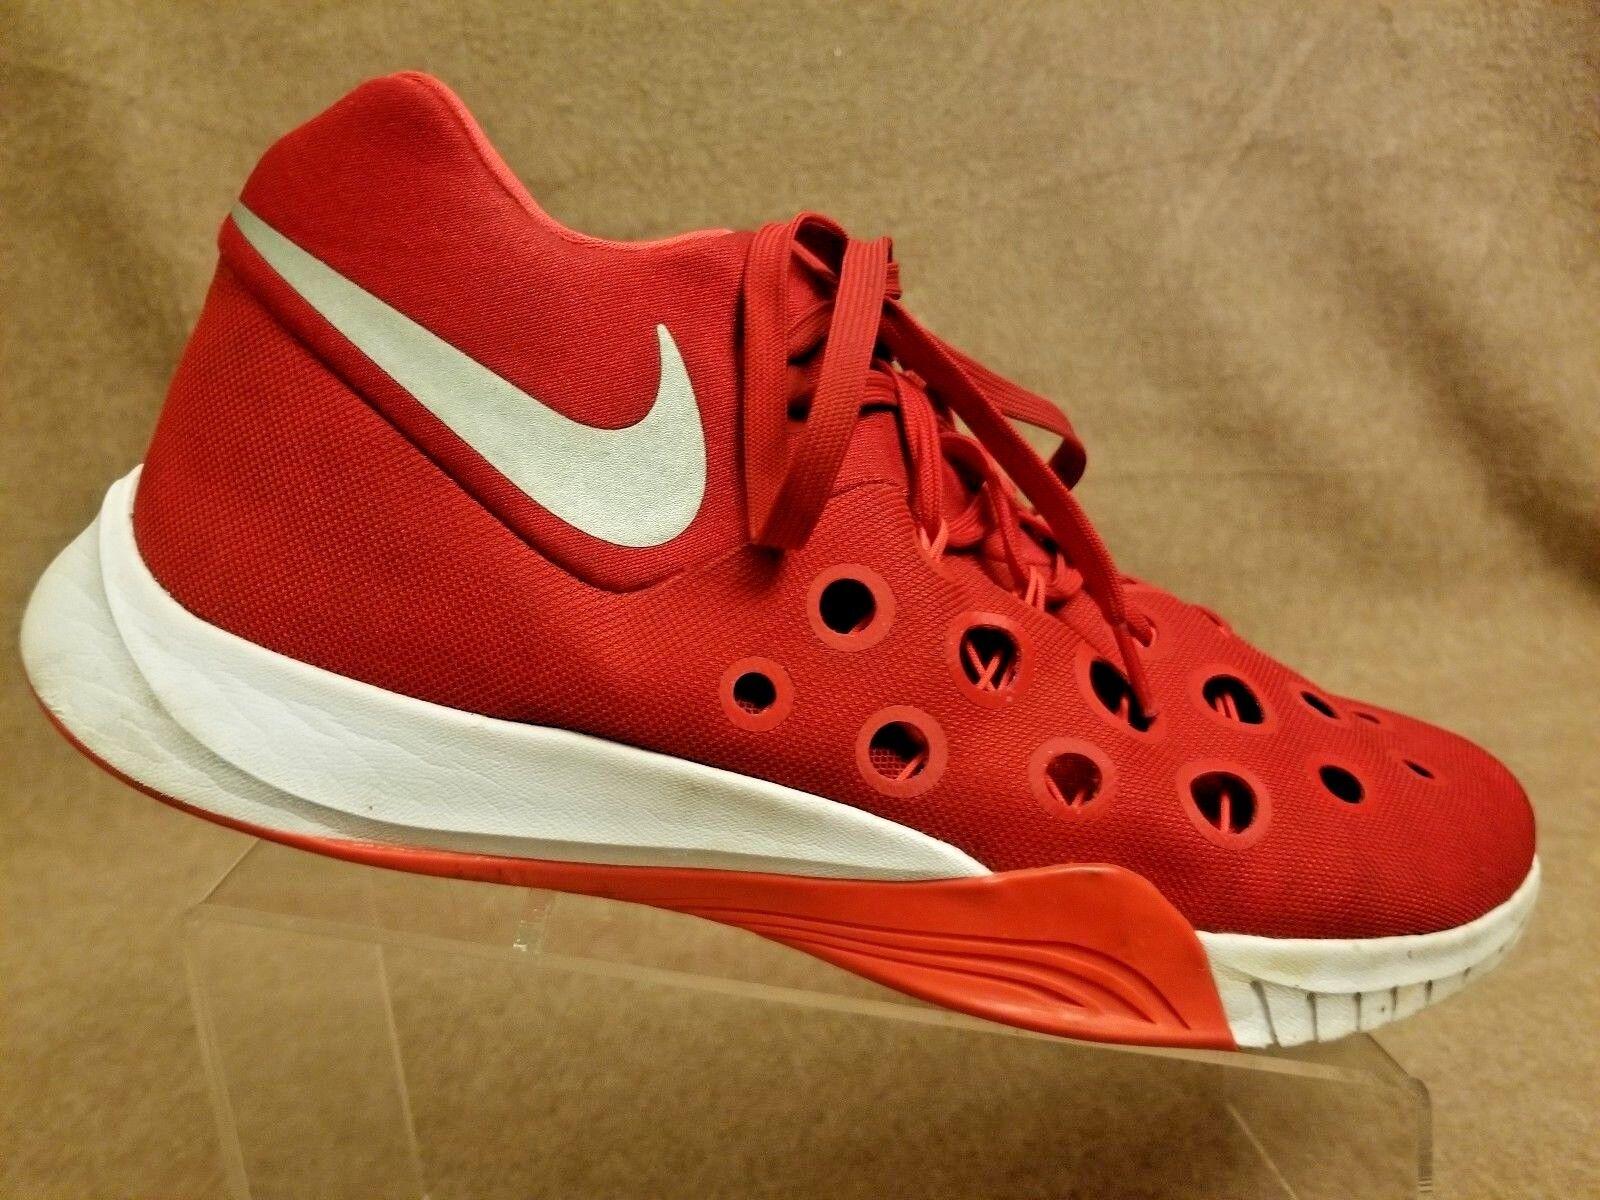 Nike zoom hyperquickness 3 basket uomini scarpe university red 749883-606 sz 13